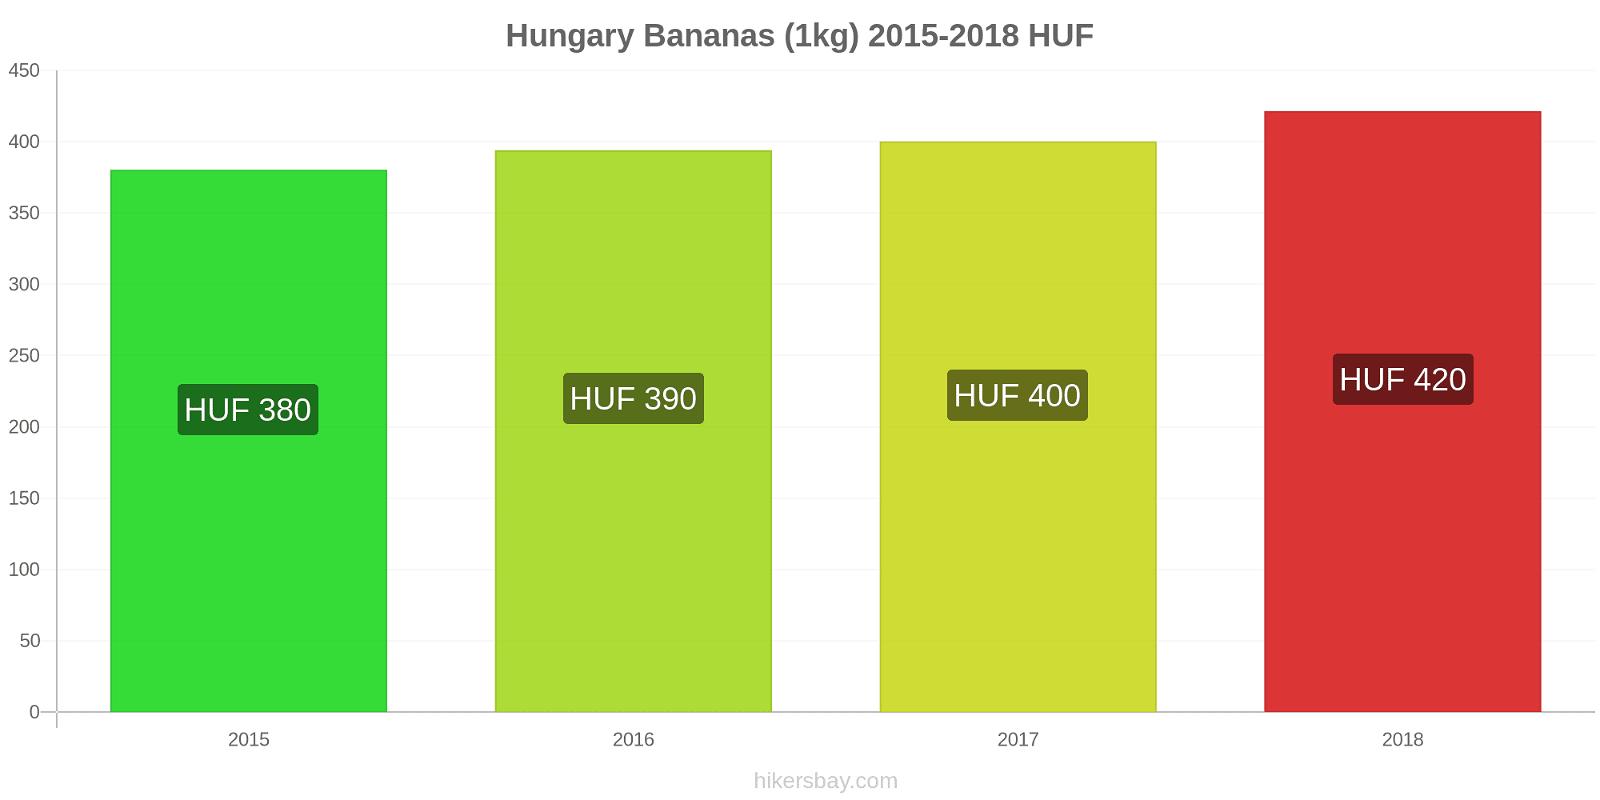 Hungary price changes Bananas (1kg) hikersbay.com